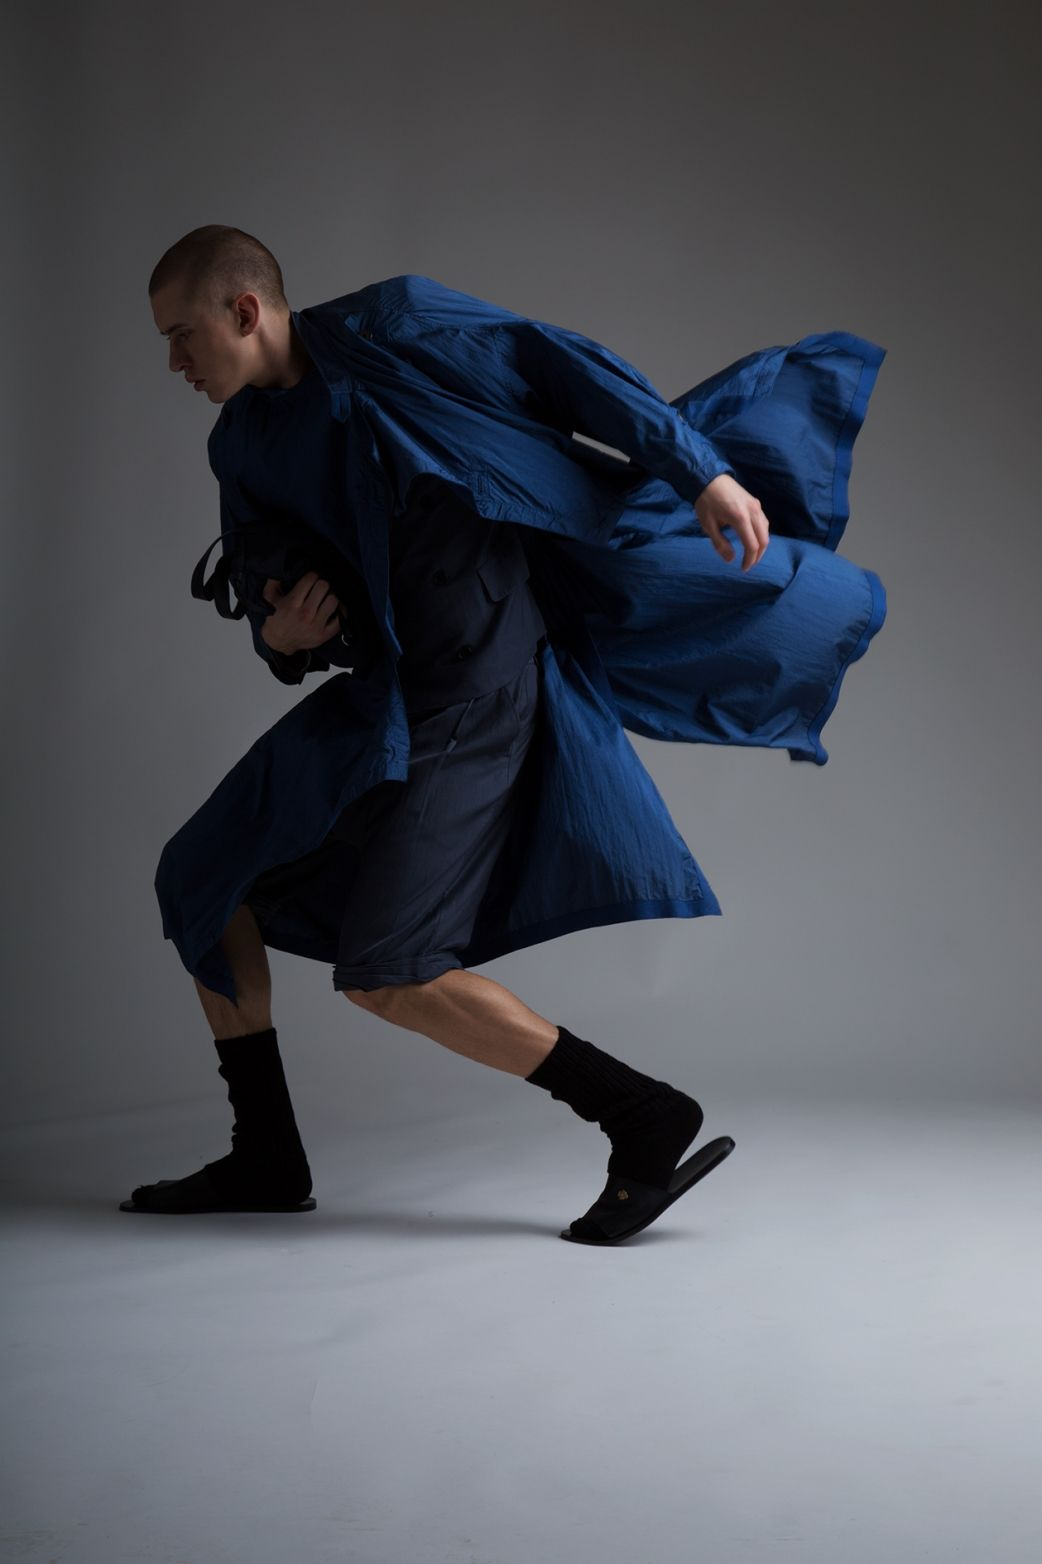 Vintage Men's Issey Miyake Coat, Jil Sander Bag, Phillip Lim Men's Blazer and Shorts. Designer Clothing Dark Minimal Street Style Fashion